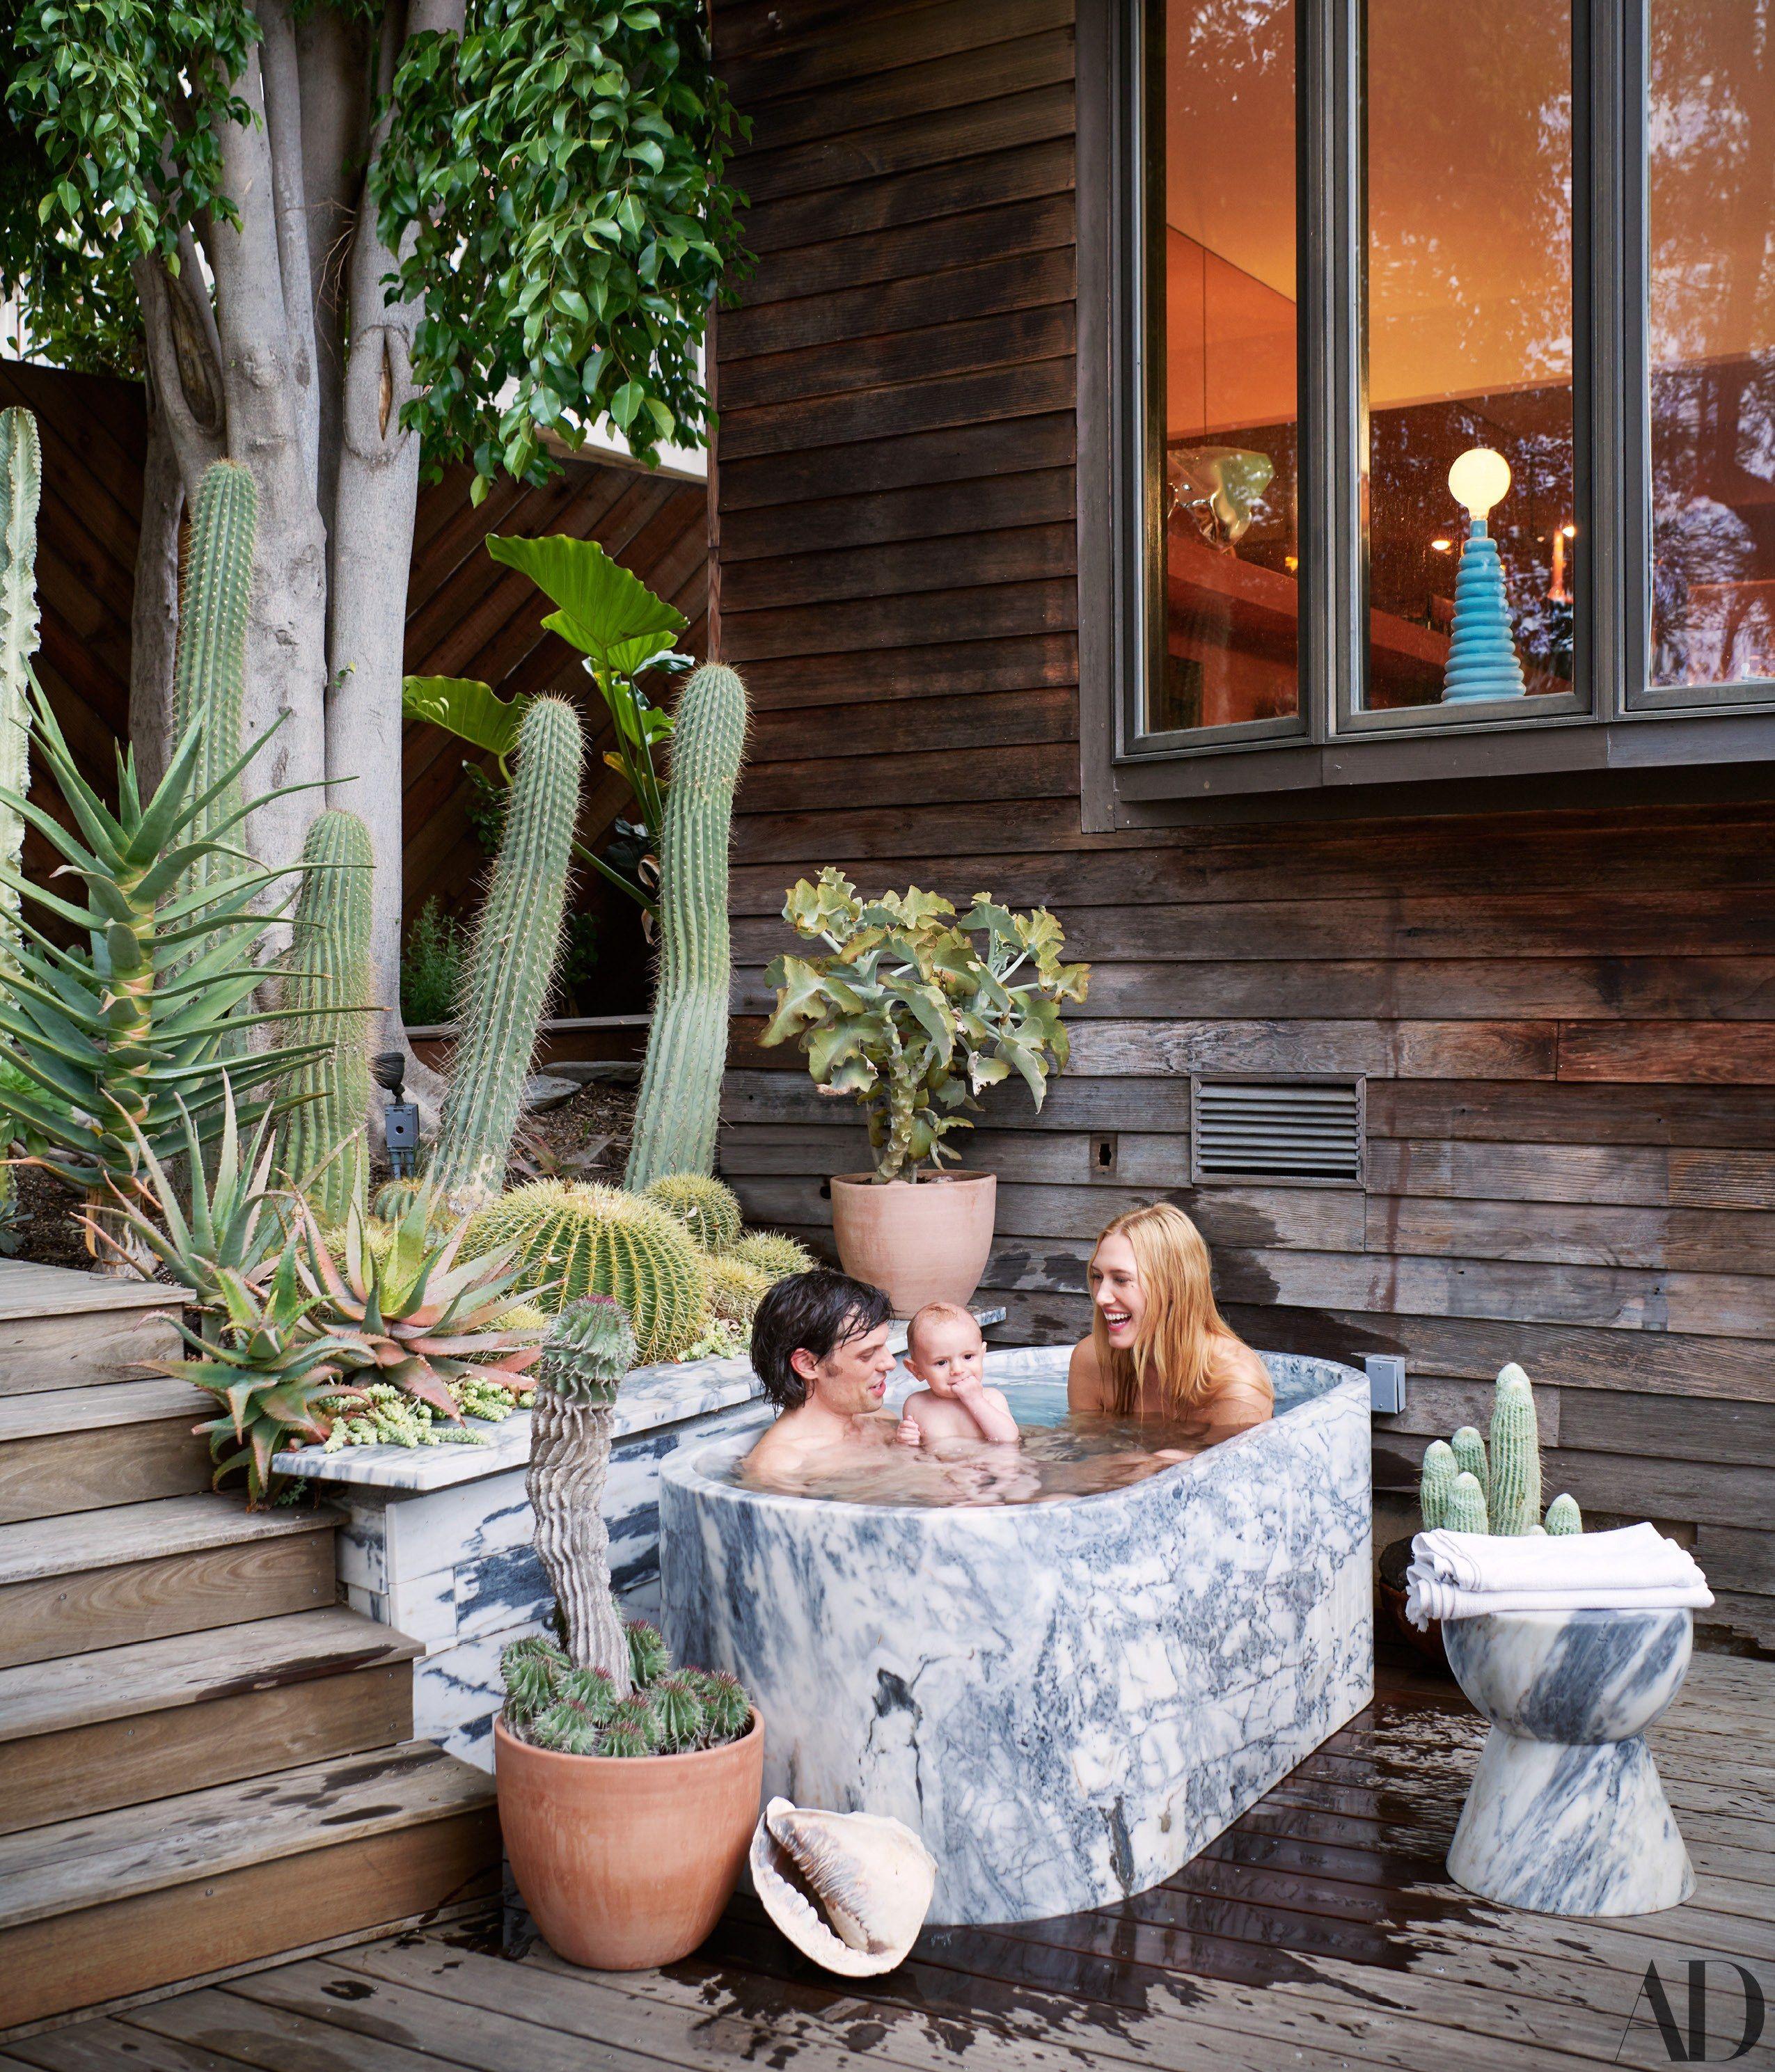 Garden Decor Los Angeles: Tour Nikolai Haas And Djuna Bel's Los Angeles Haven